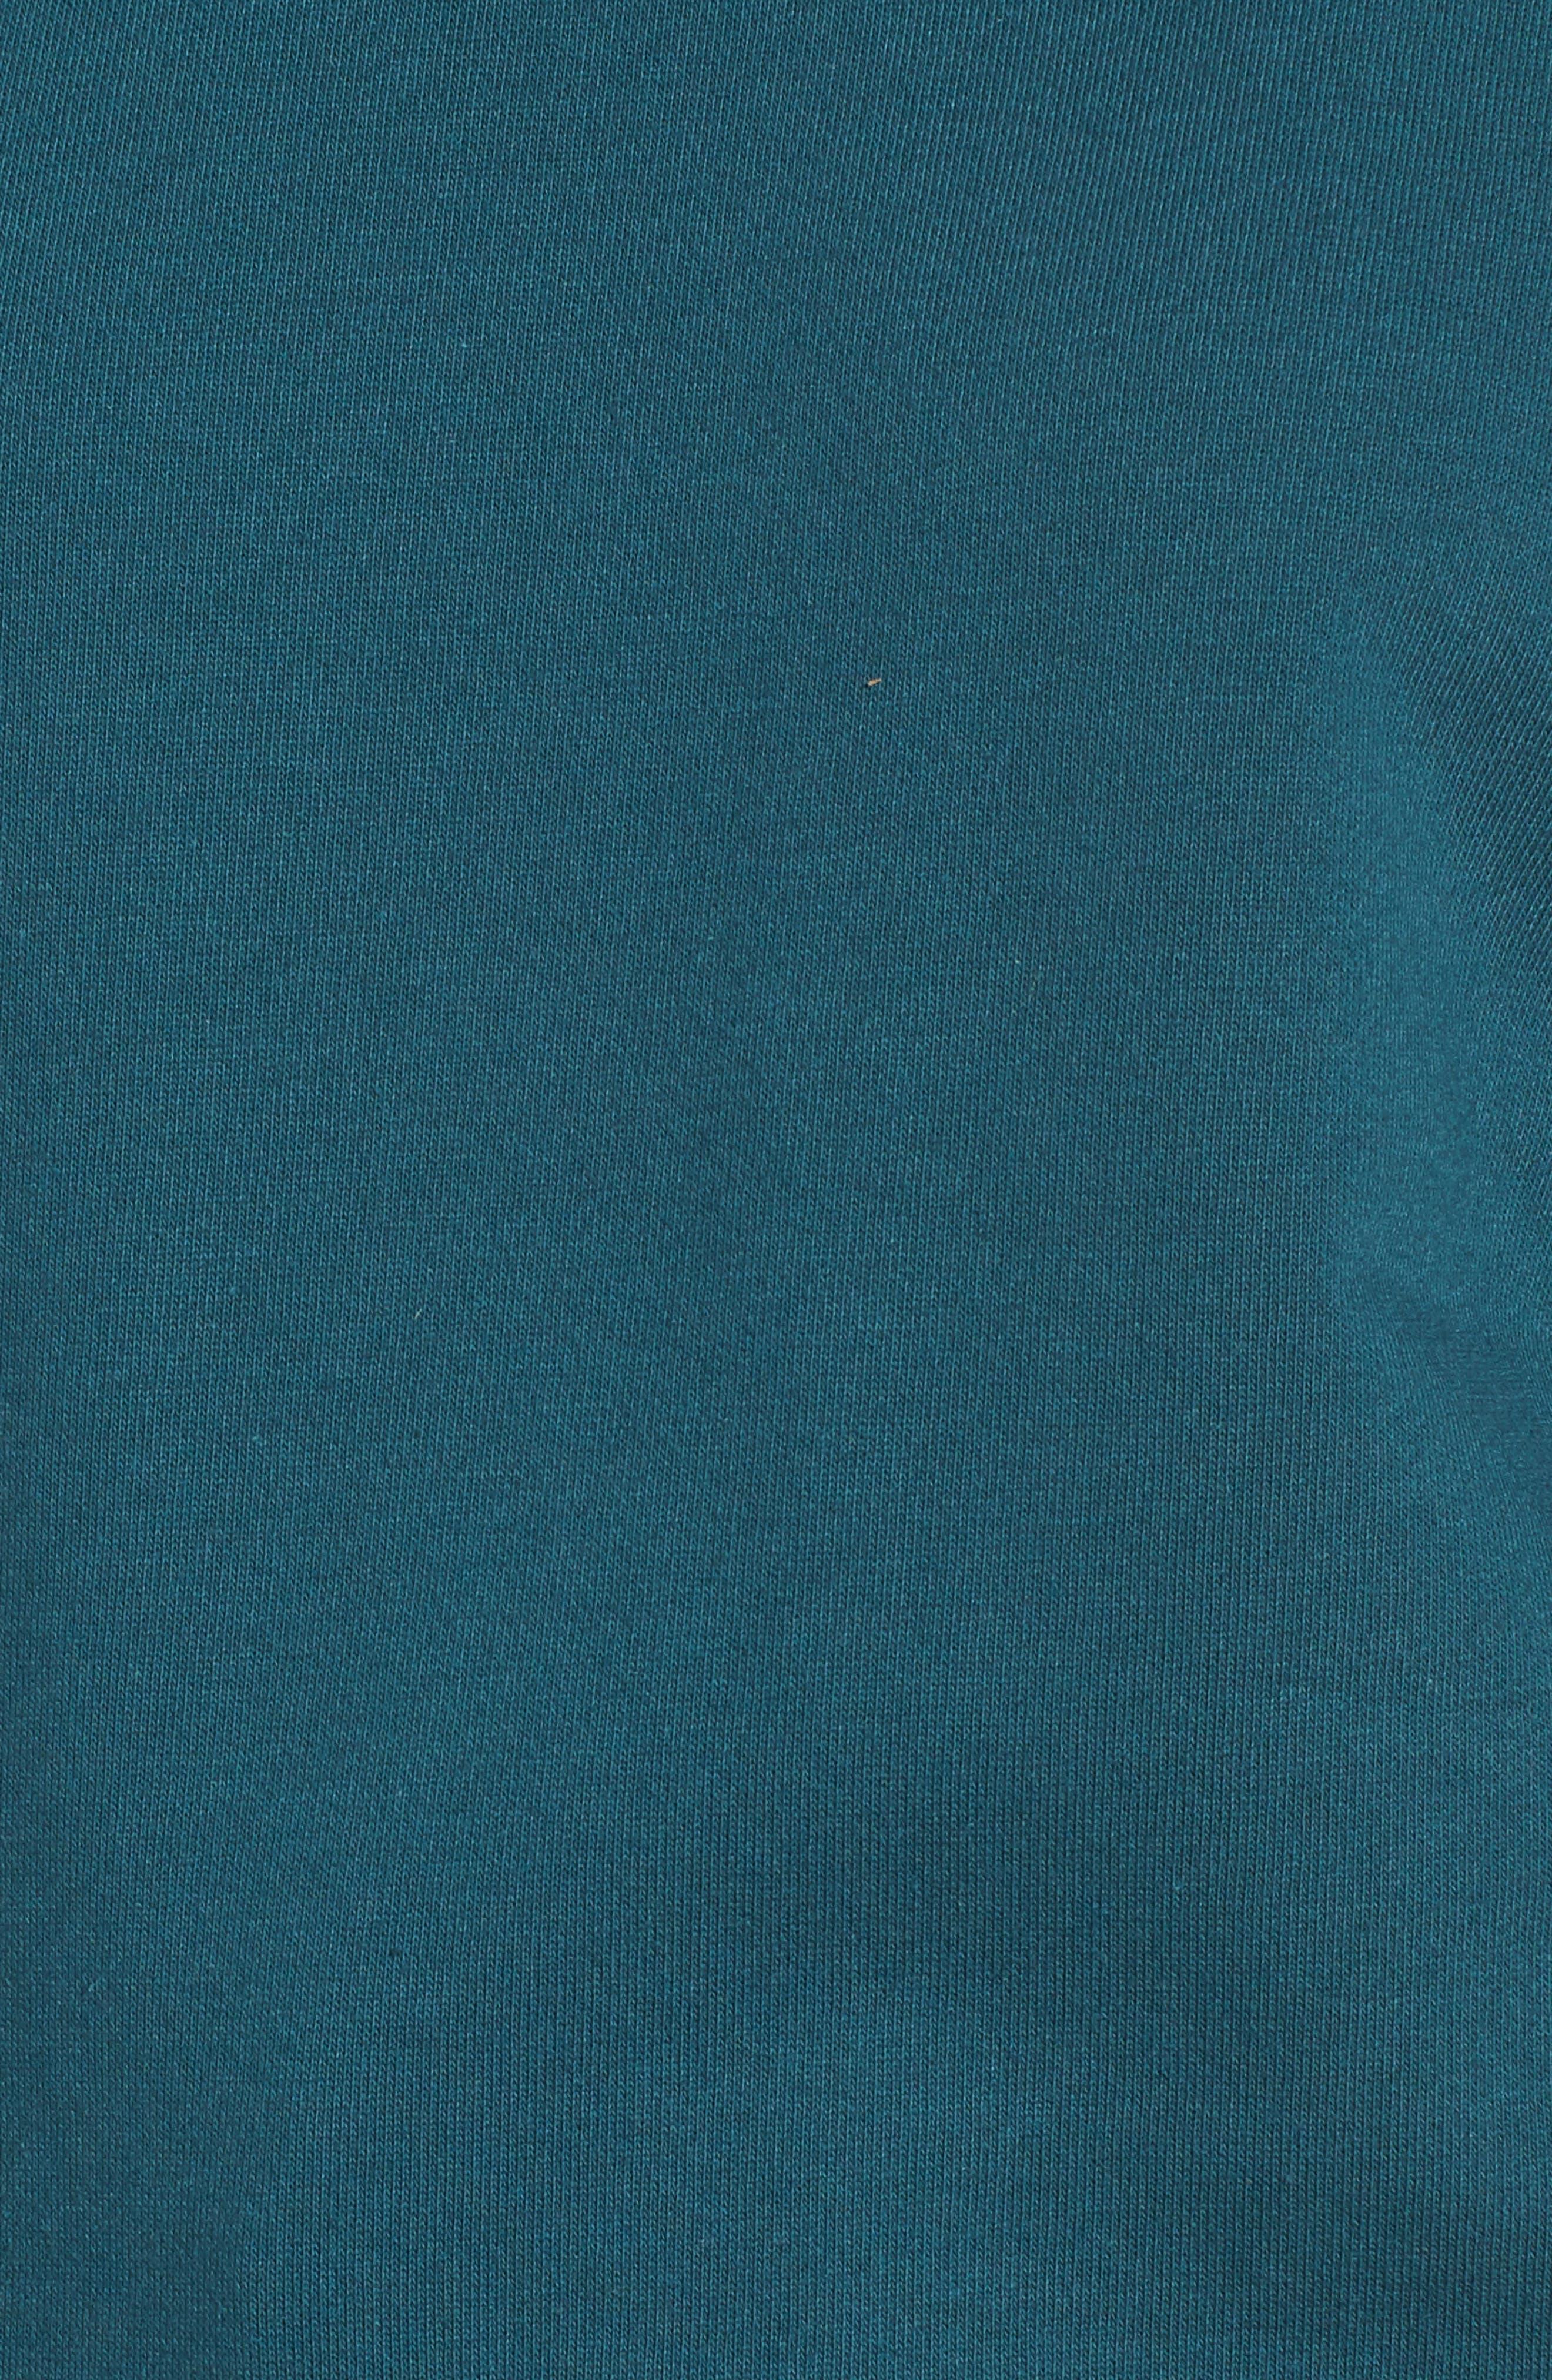 Cinched Sleeve Sweatshirt,                             Alternate thumbnail 5, color,                             Teal